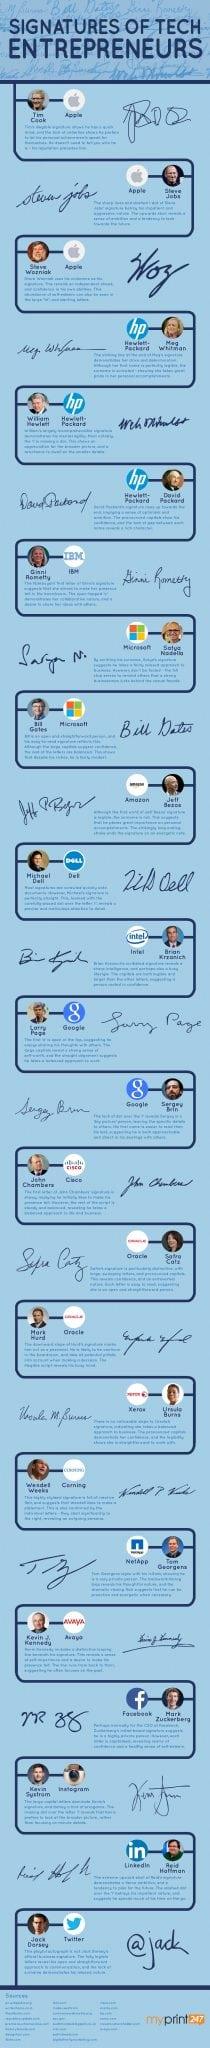 Famous-Signatures